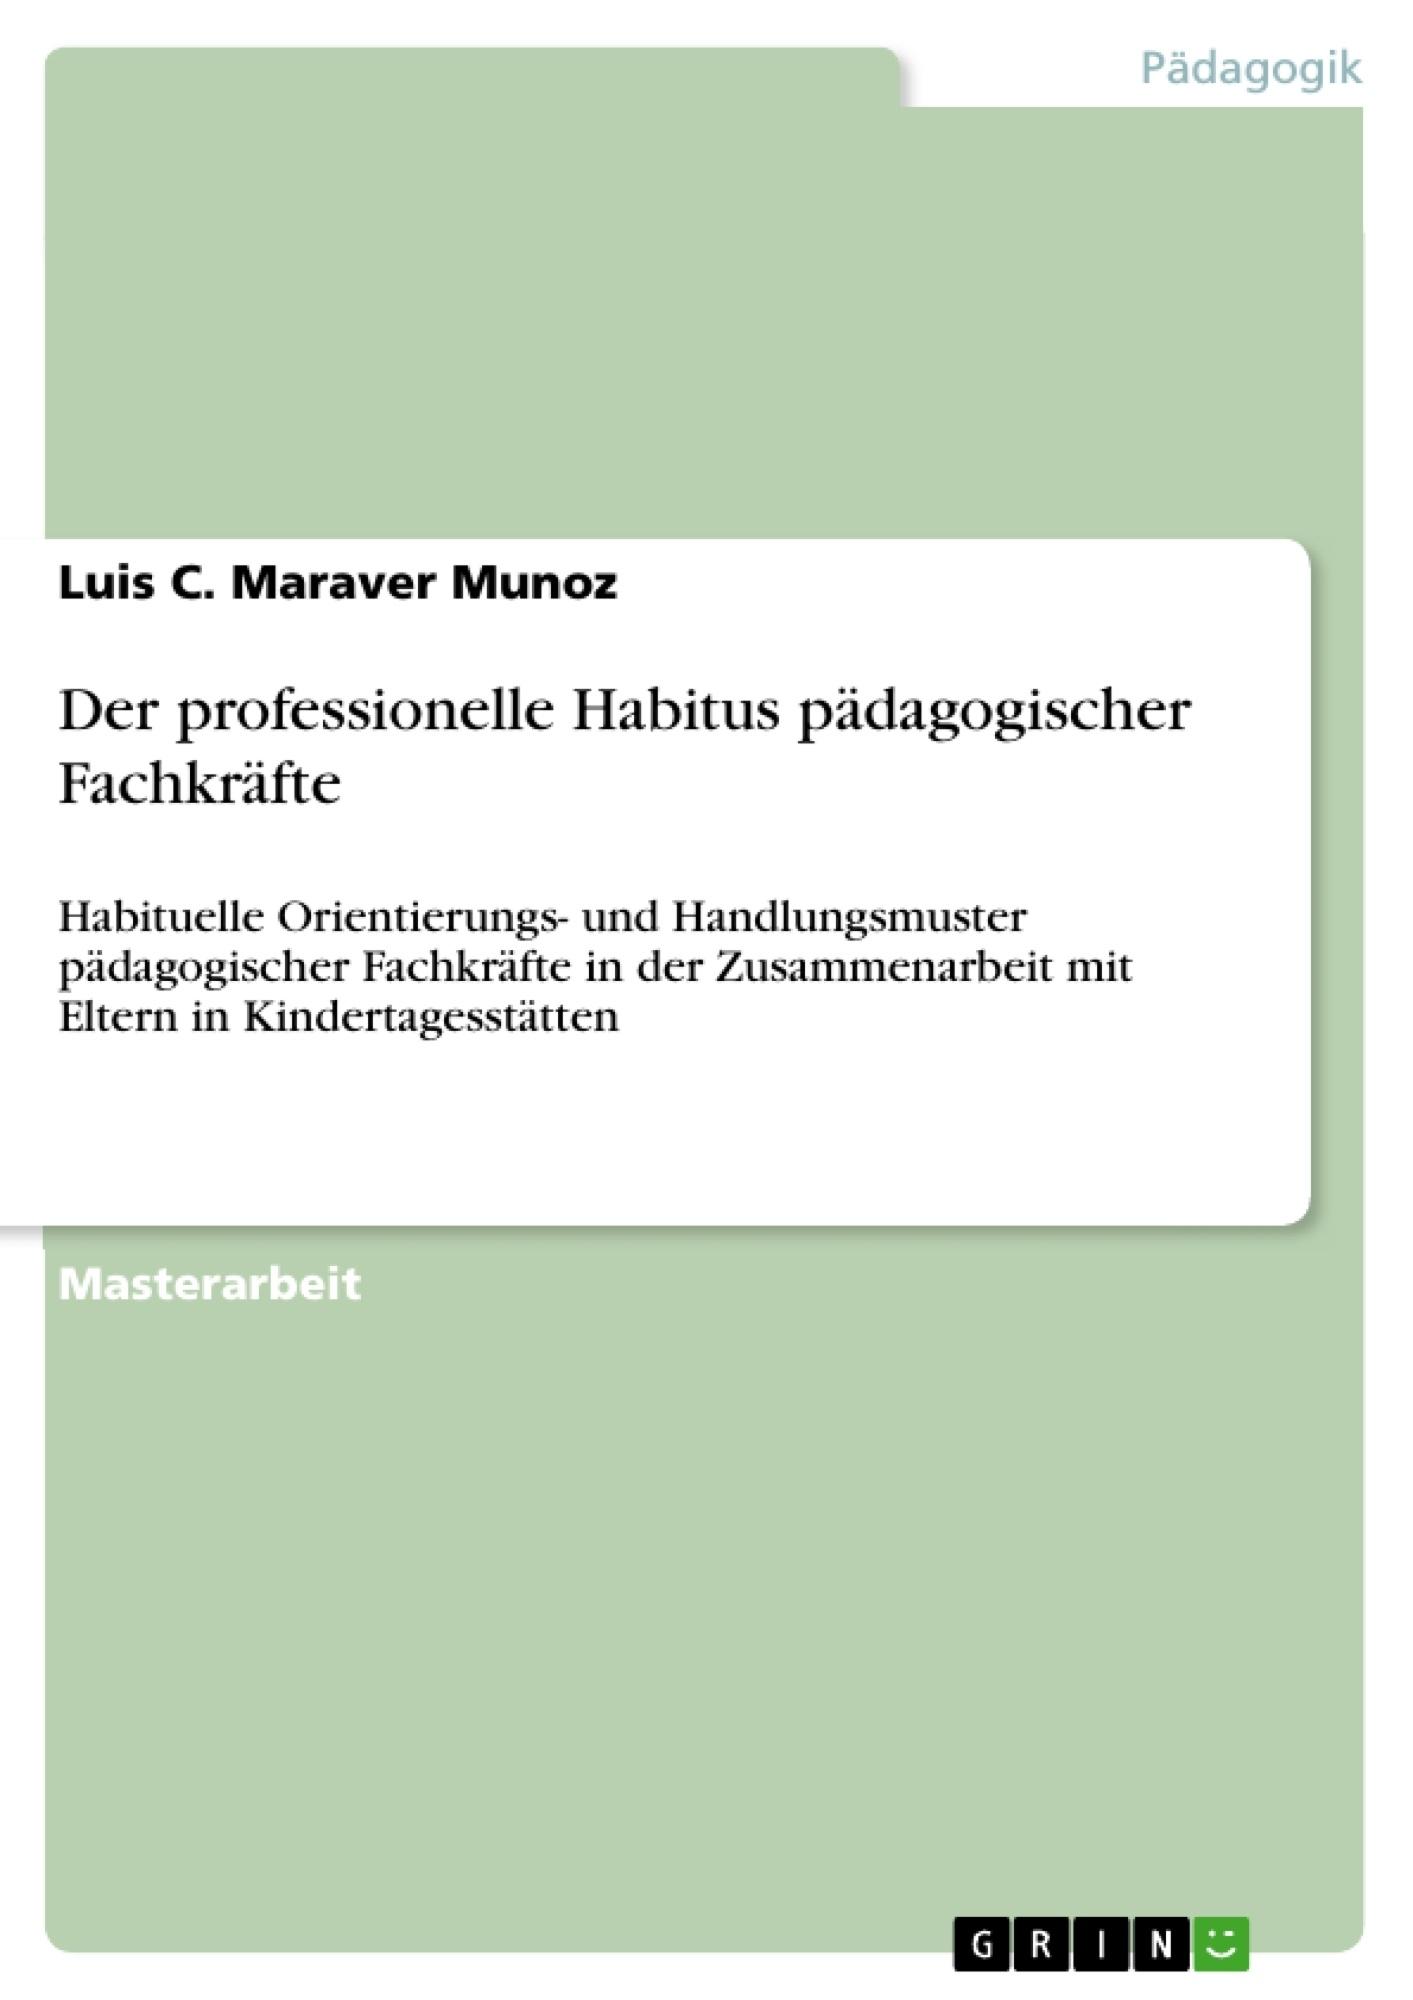 Titel: Der professionelle Habitus pädagogischer Fachkräfte